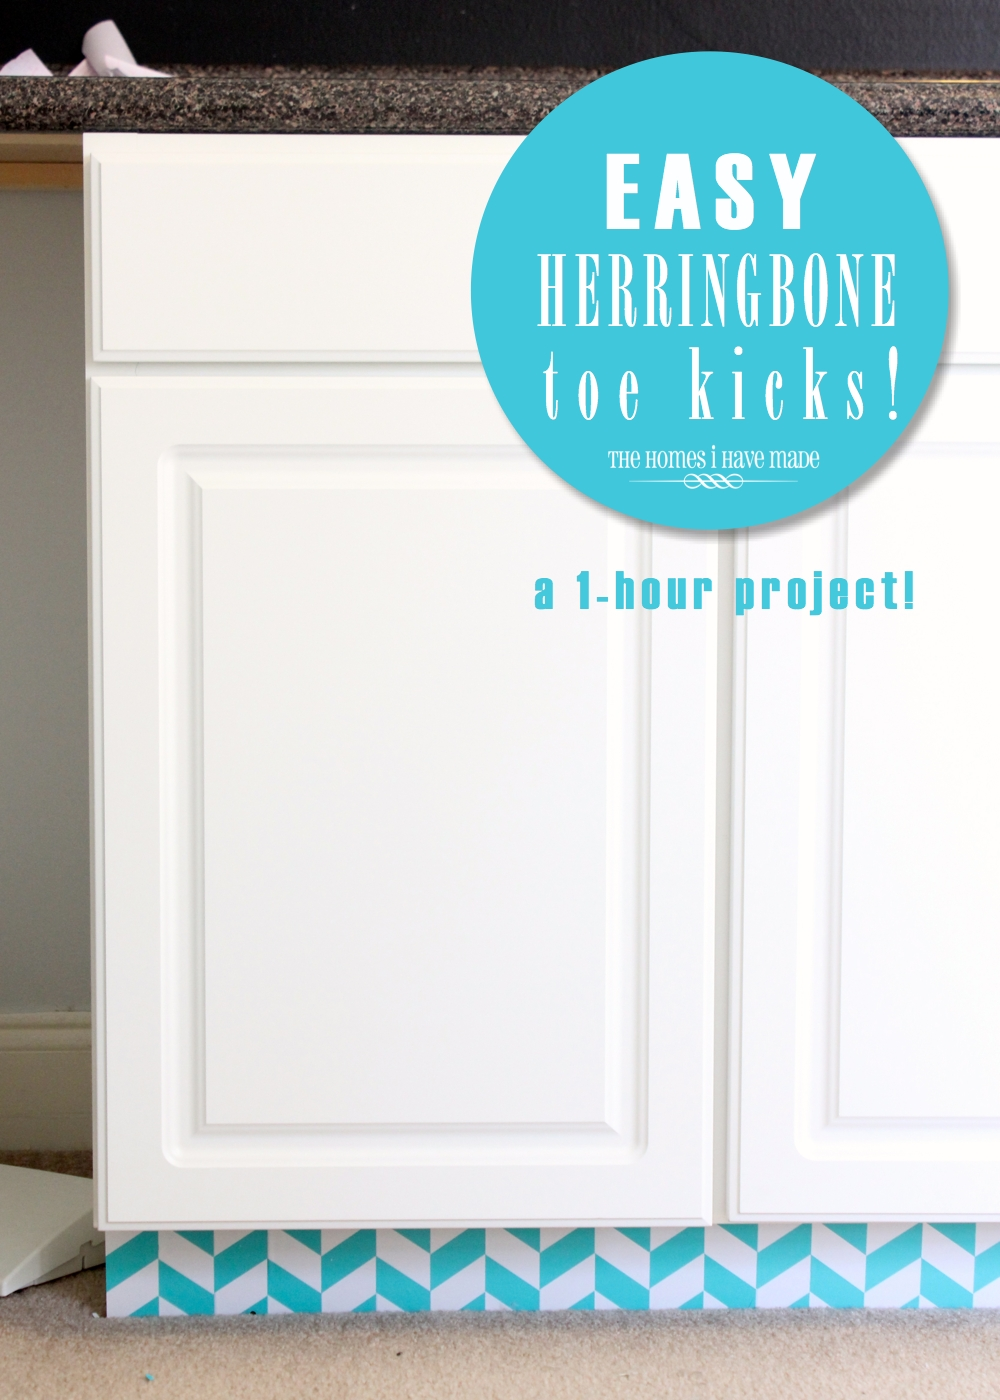 Herringbone Toe Kicks-001